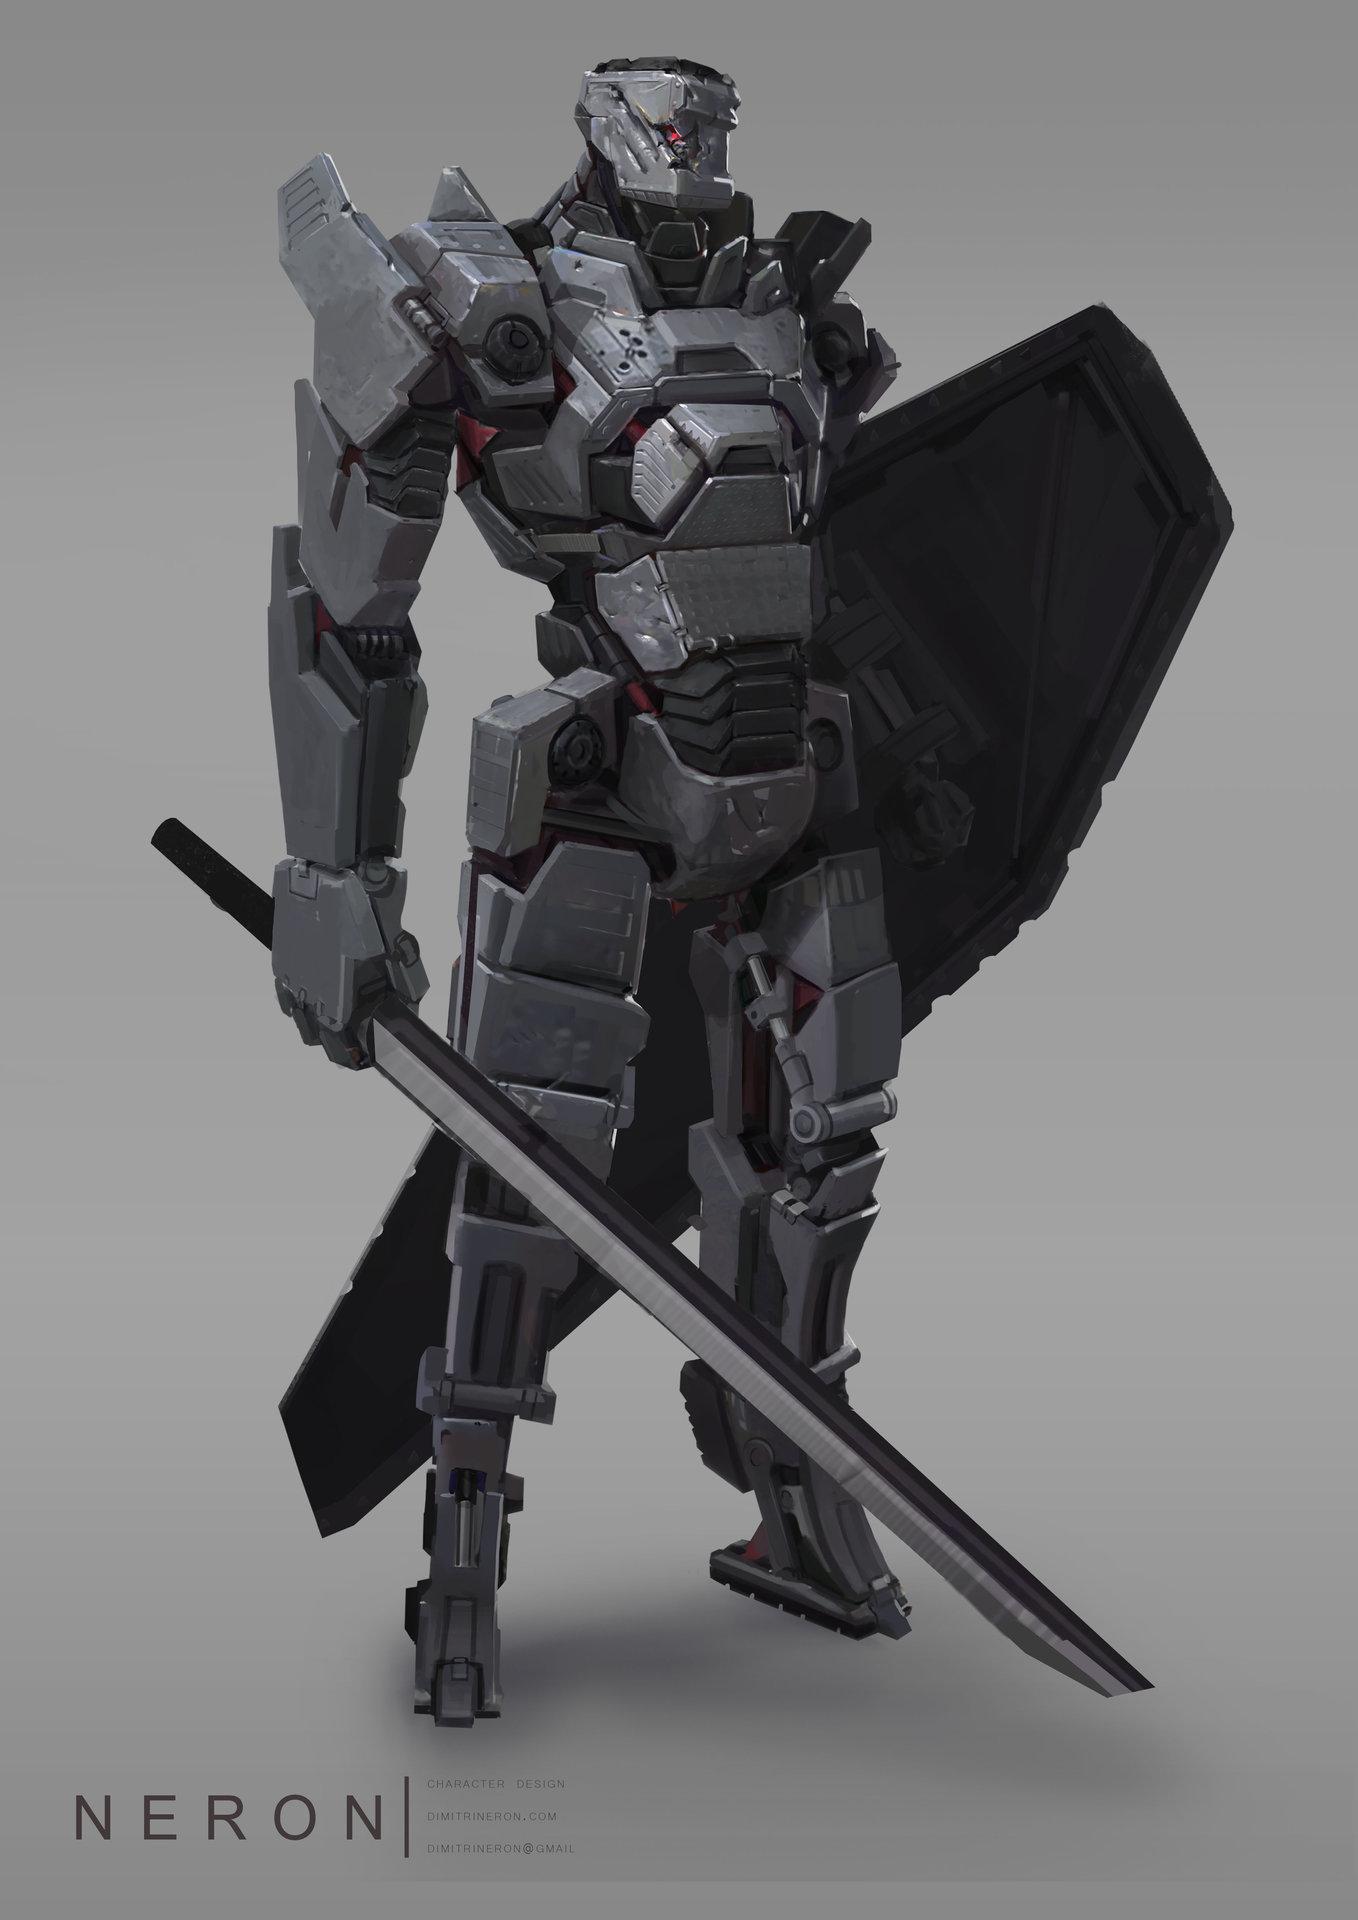 dimitri-neron-rrrrobot.jpg?1424973678